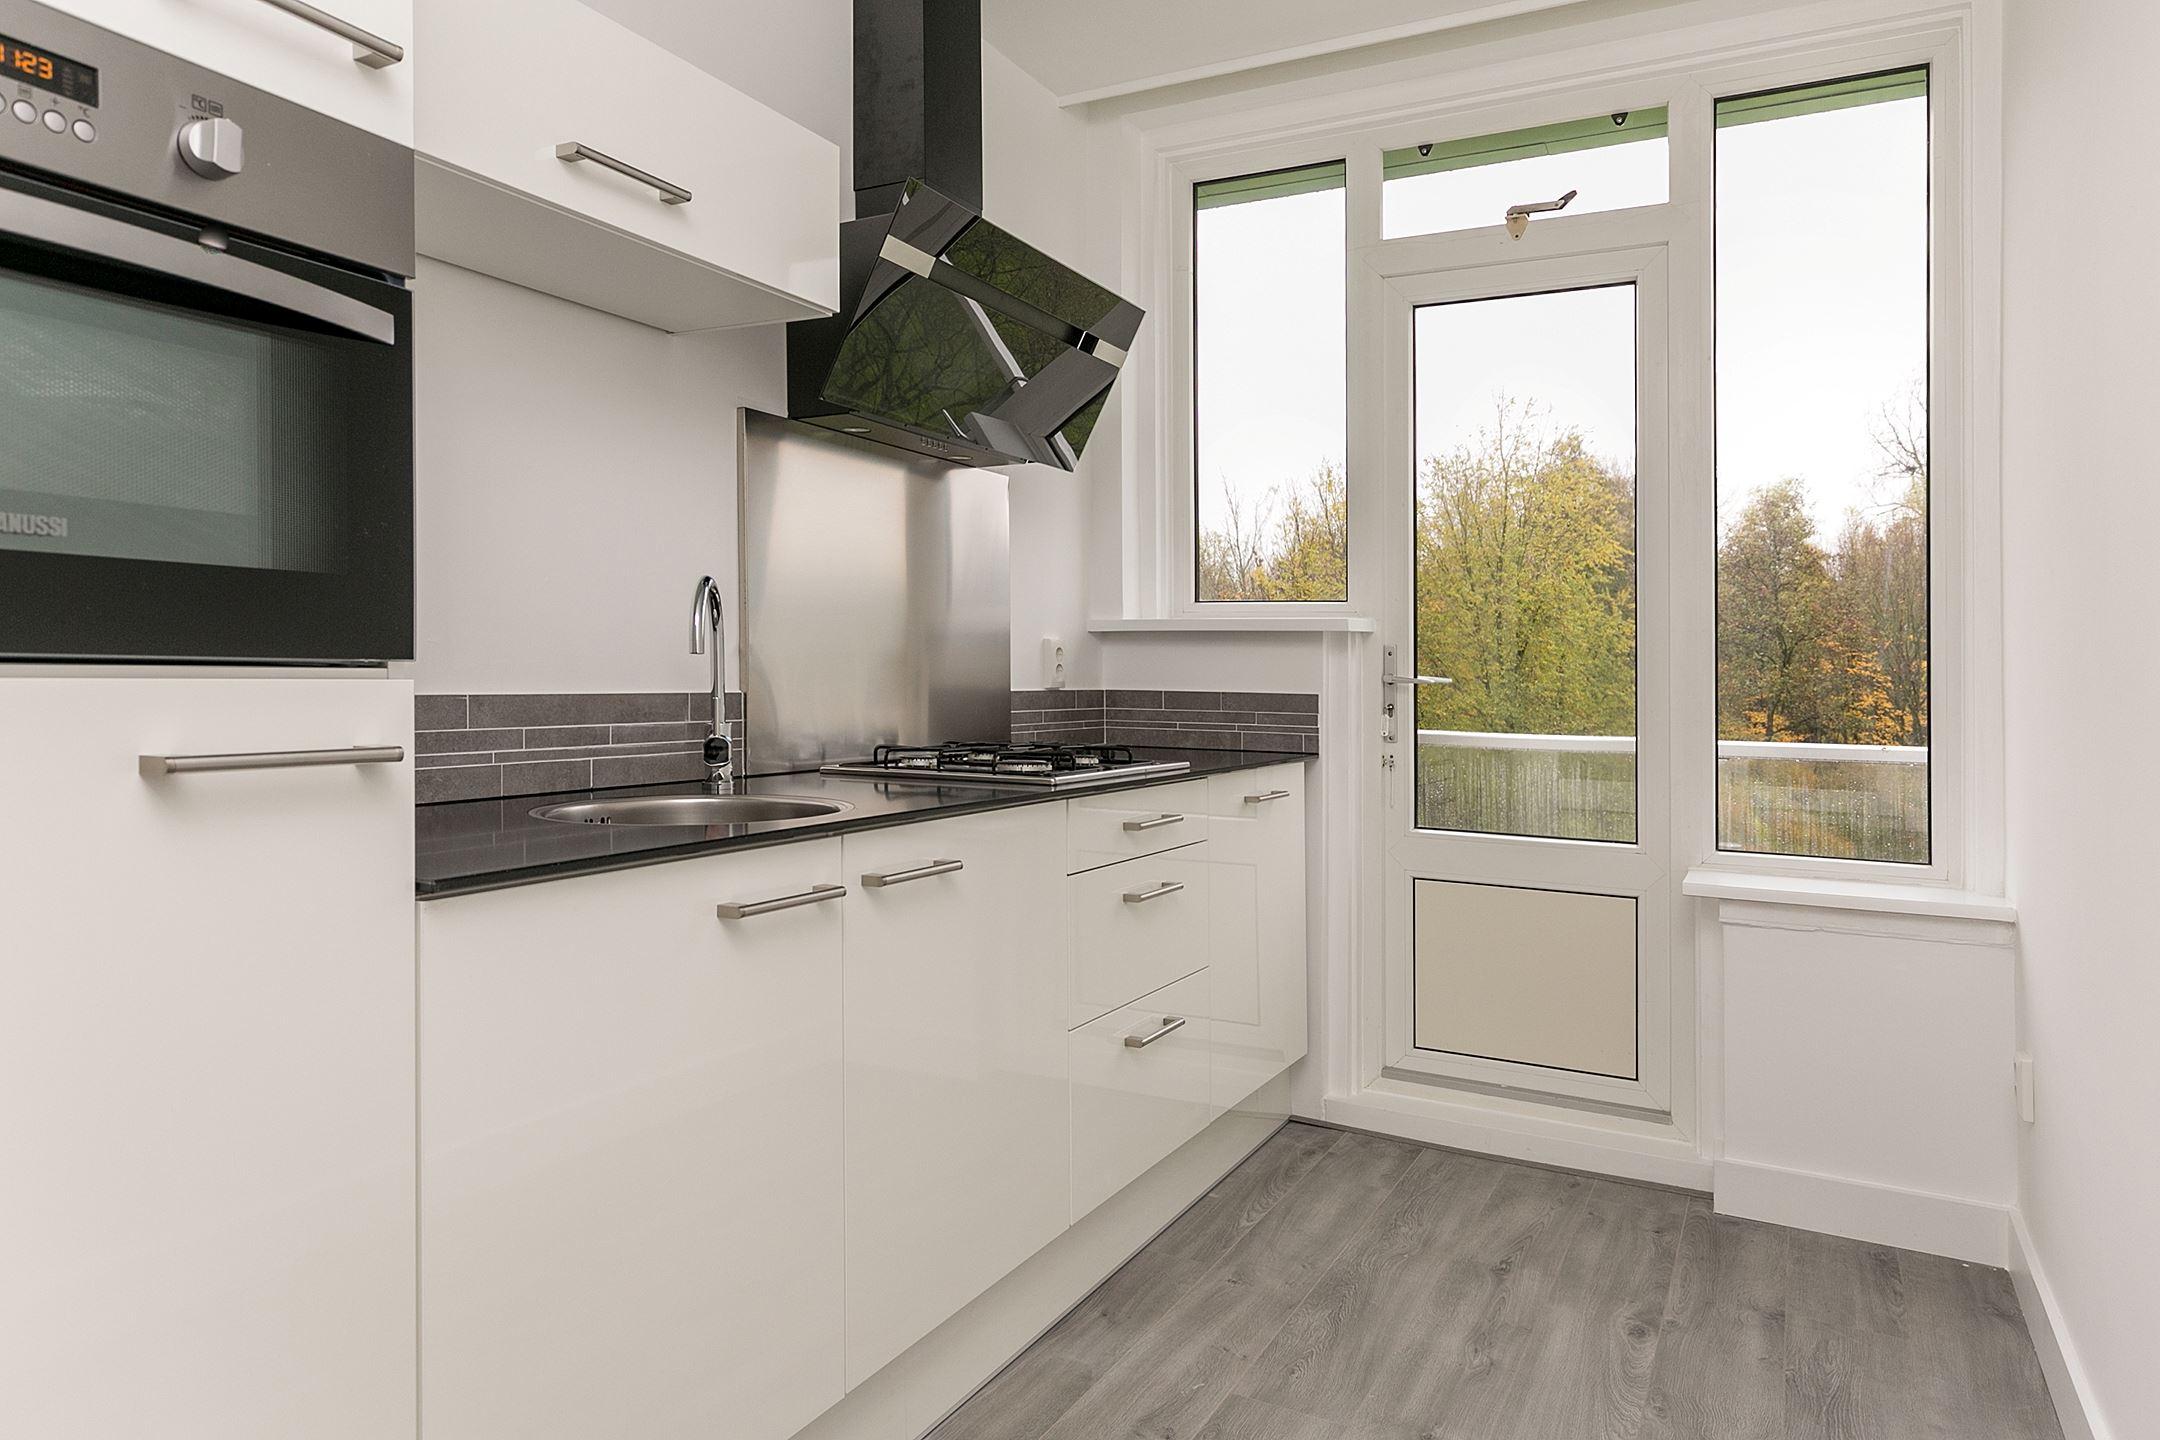 keuken tegels rotterdam : Verkocht Van Wijngaardenlaan 117 3078 Js Rotterdam Funda